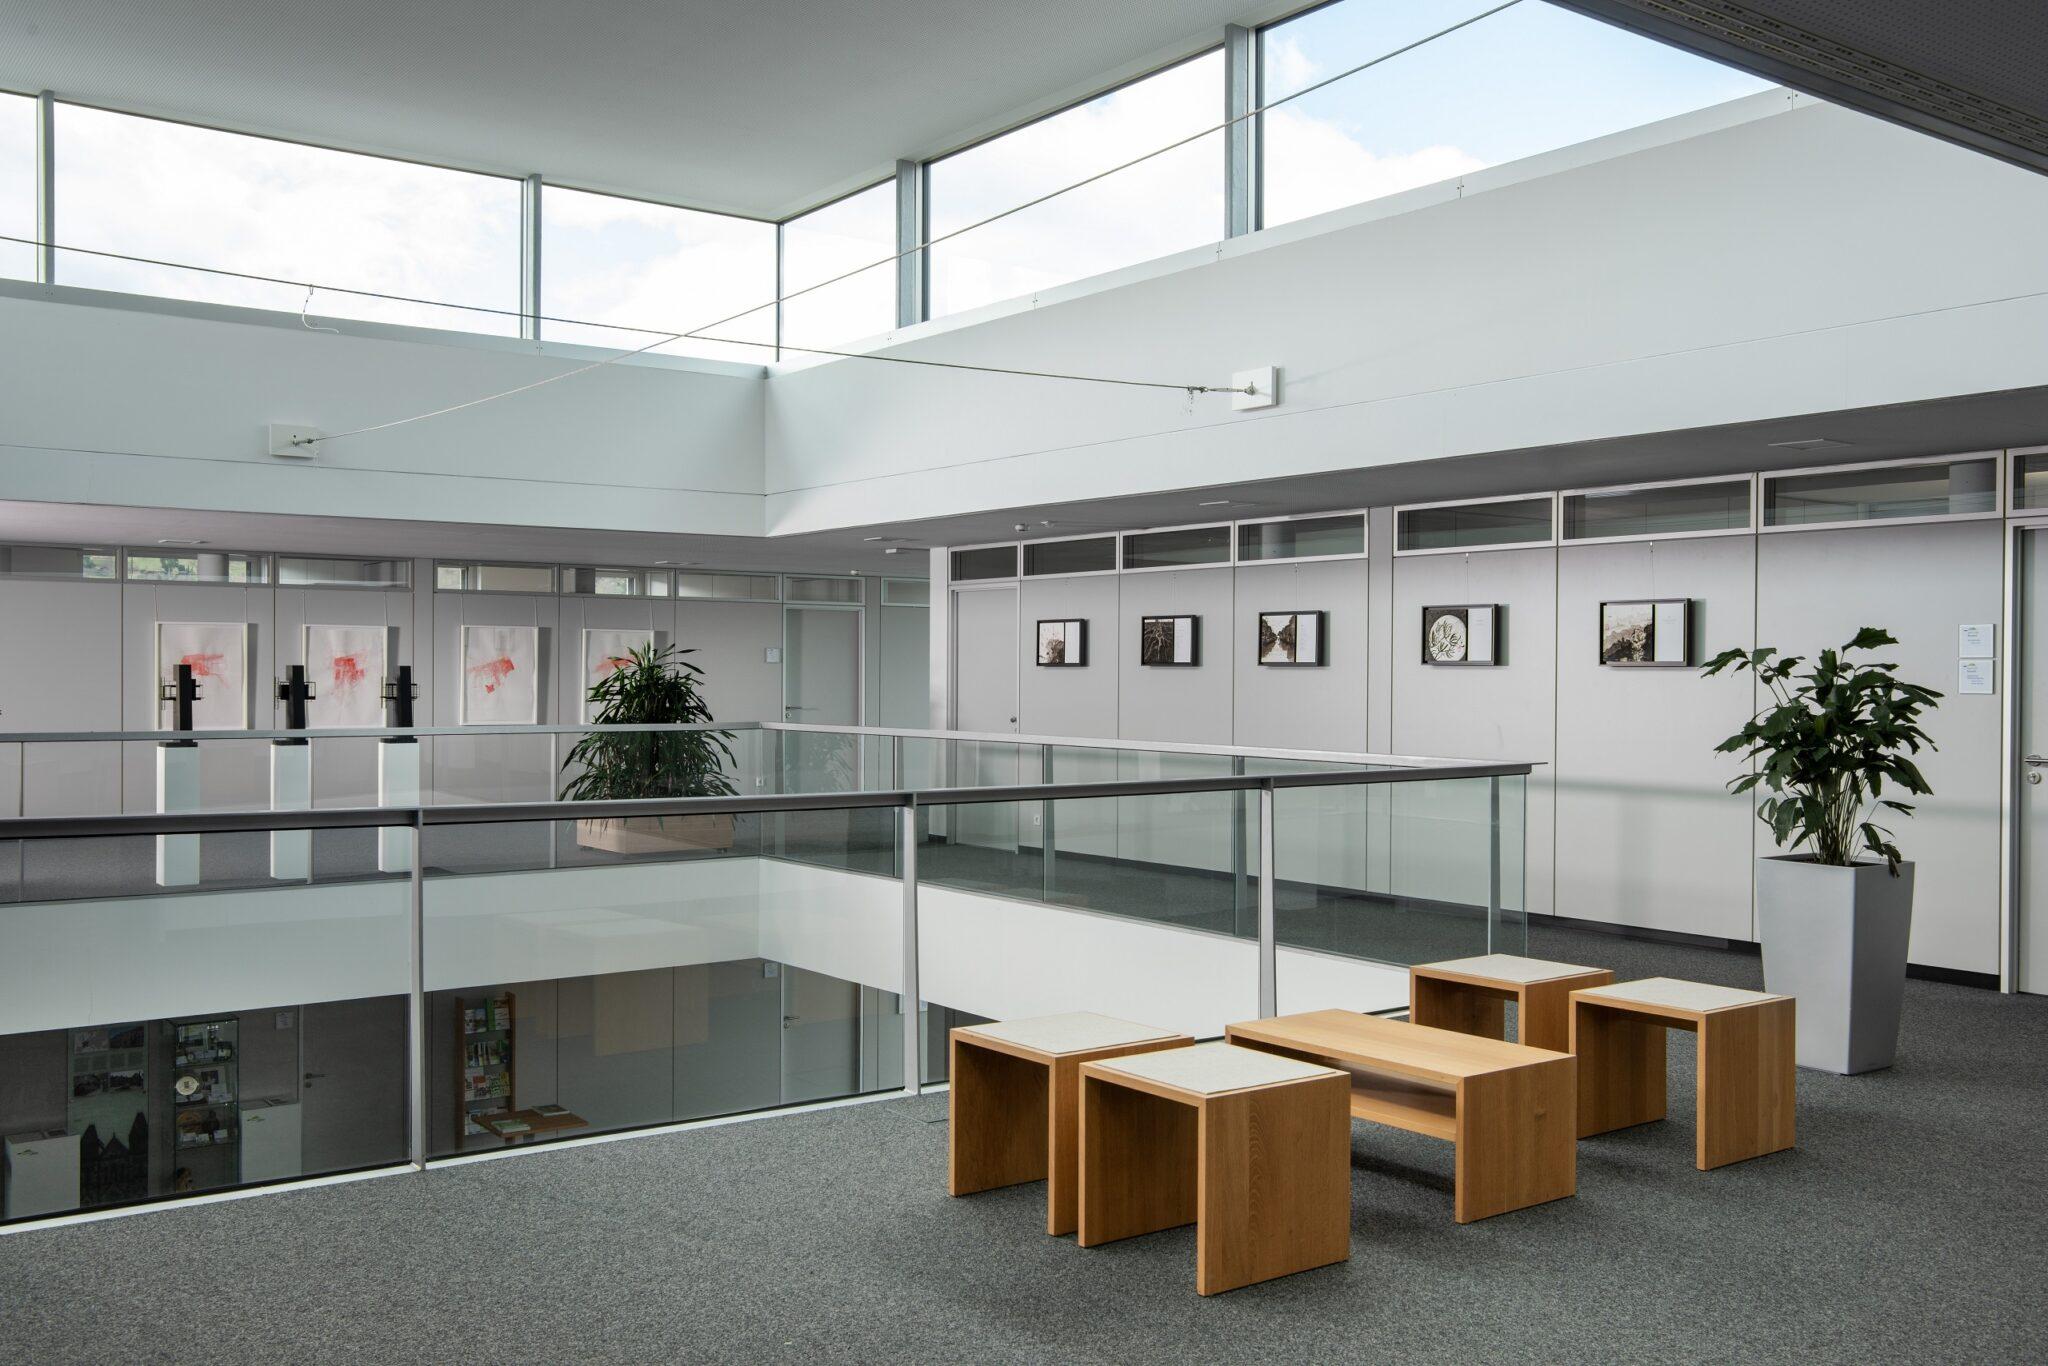 Atrium. Bild: Frank Kleinbach